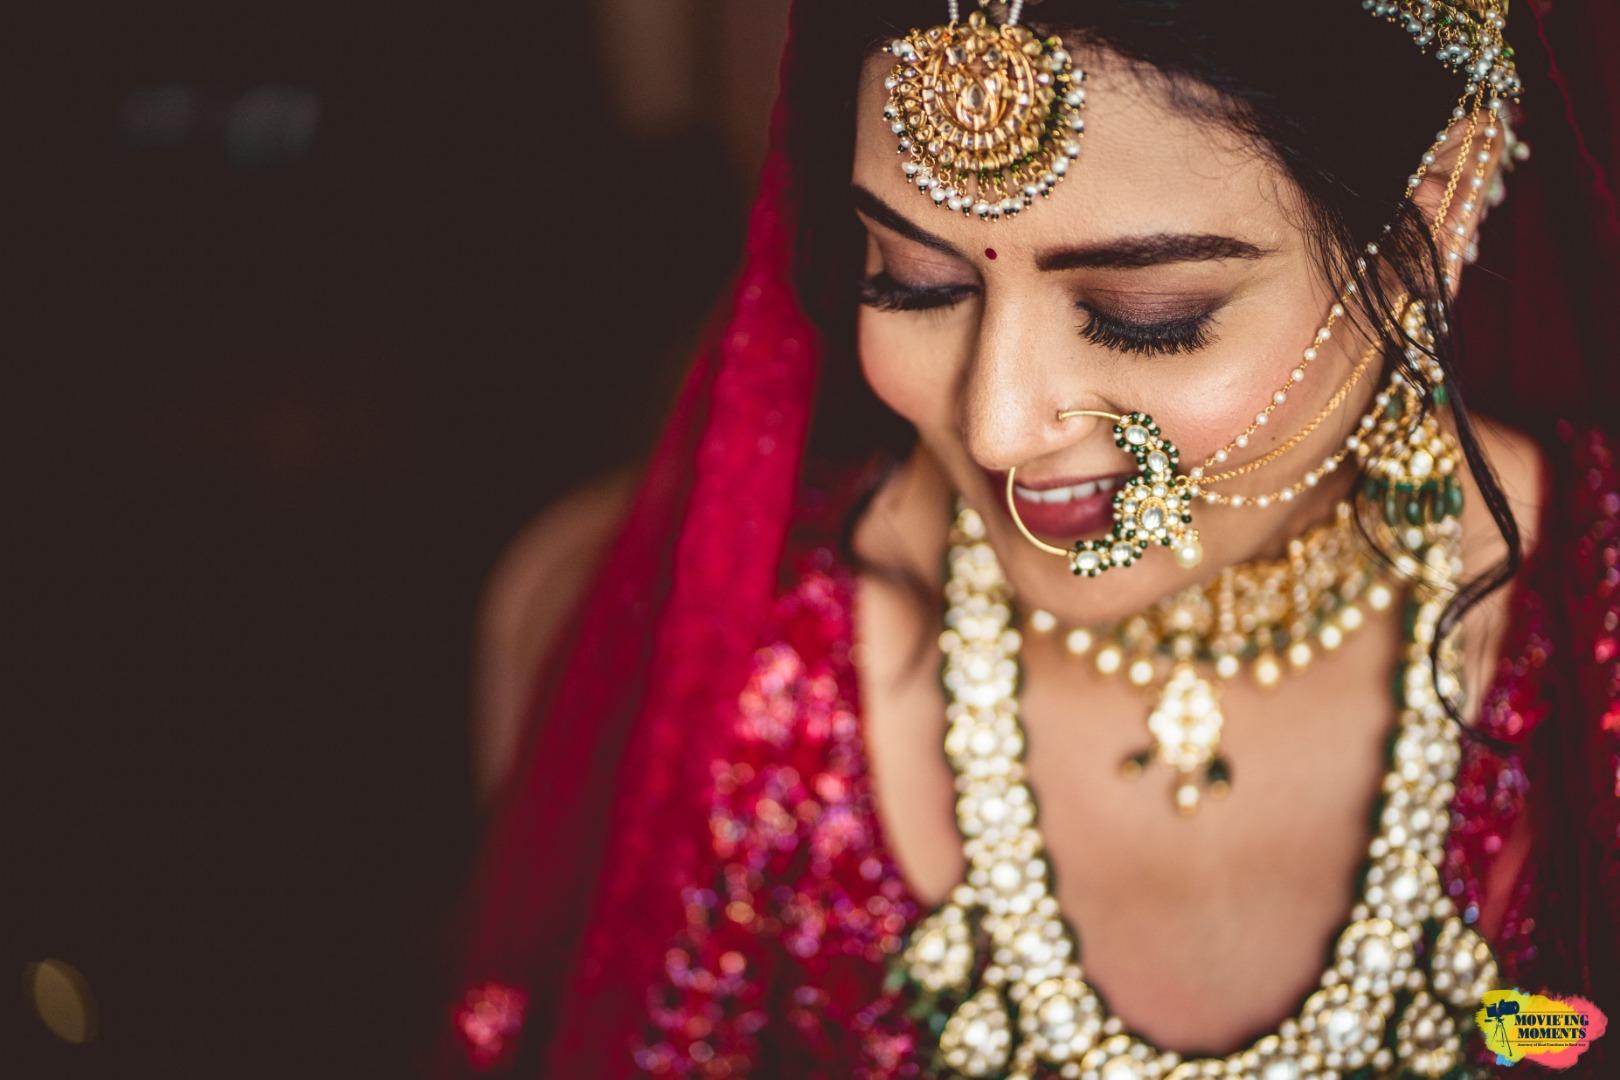 beautiful shot of the happy bride